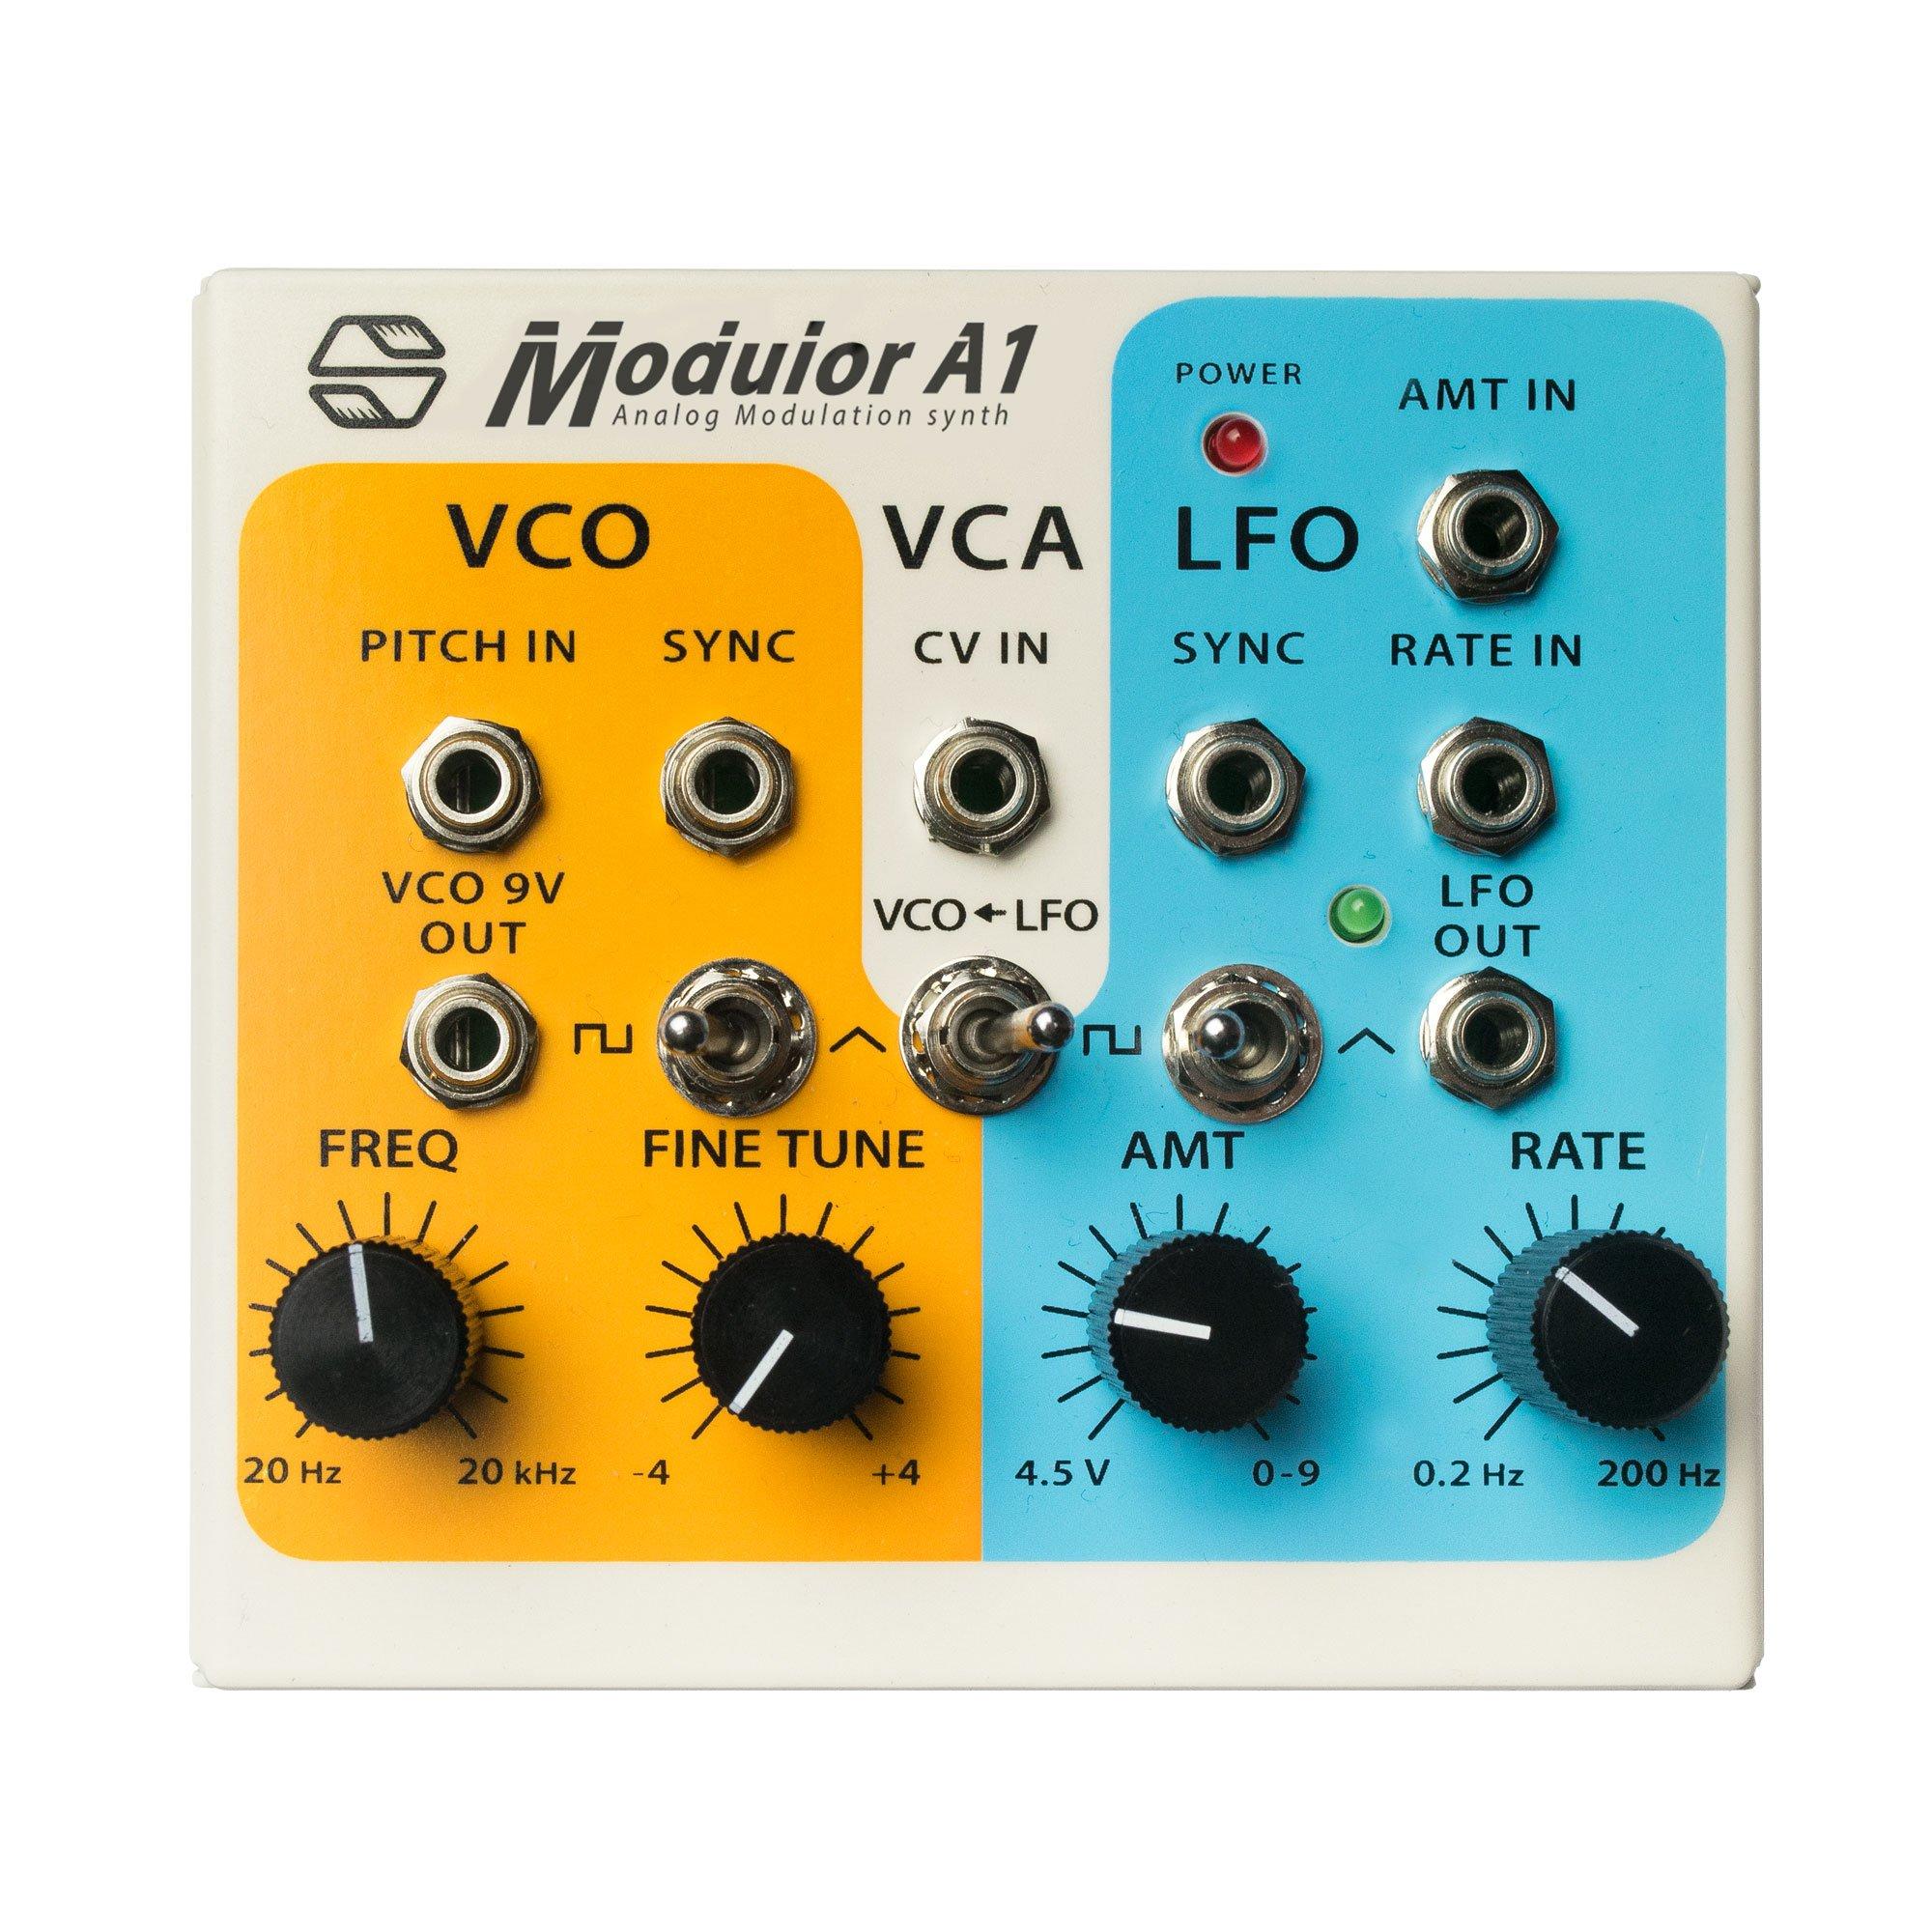 Modulor A1 : Semi-Modulor Analog Modulation Synthesizer by Sonicsmith